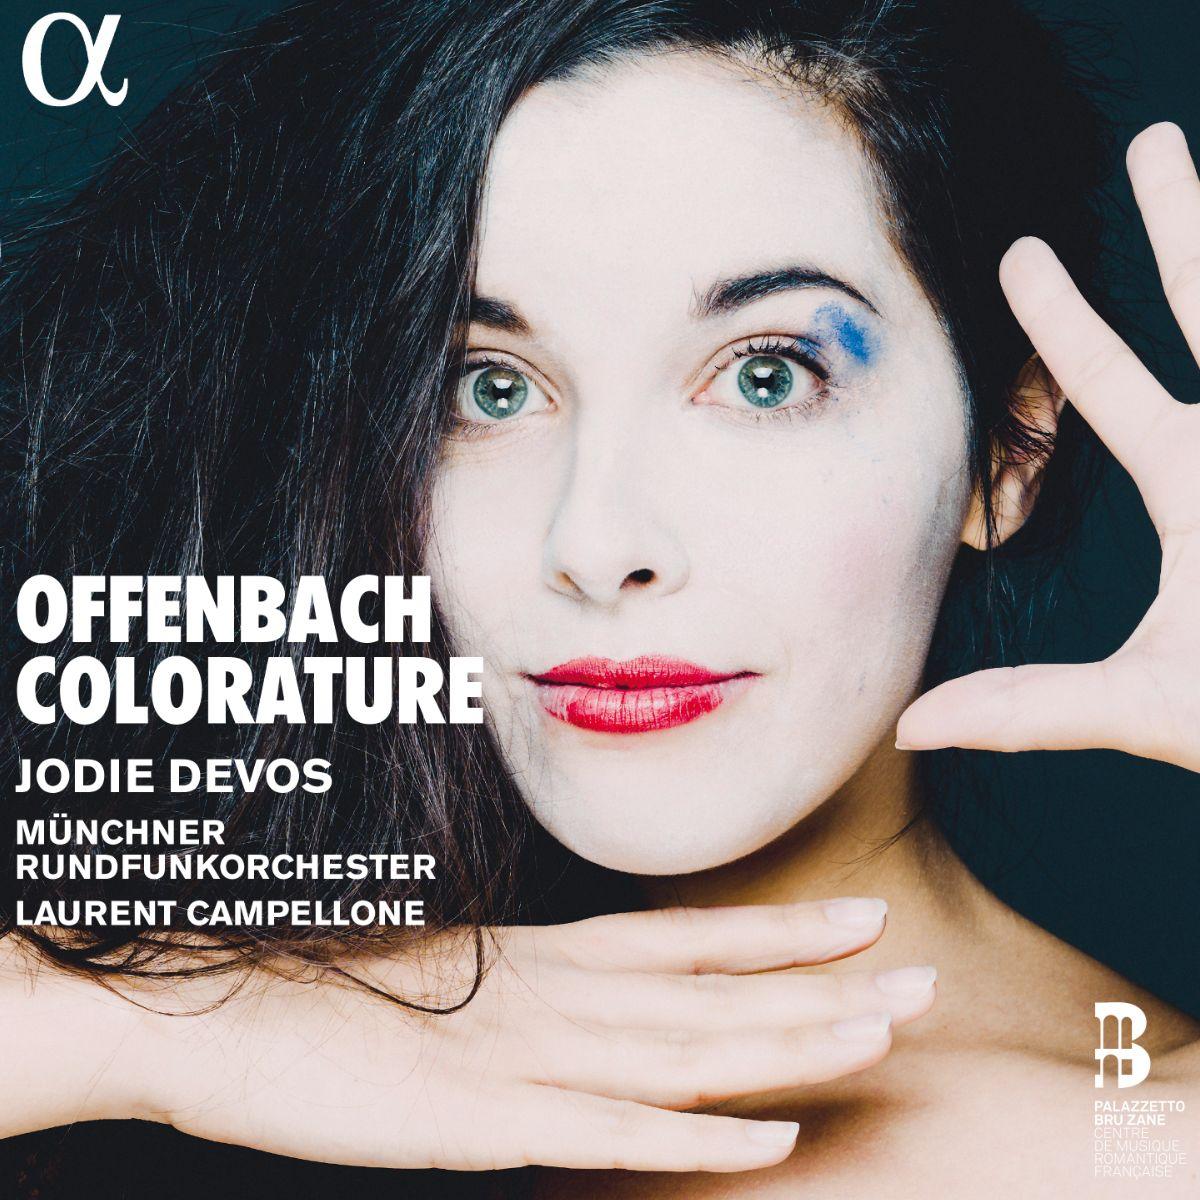 OFFENBACH coloratoure cd opera concert critique cd review cd classiquenews